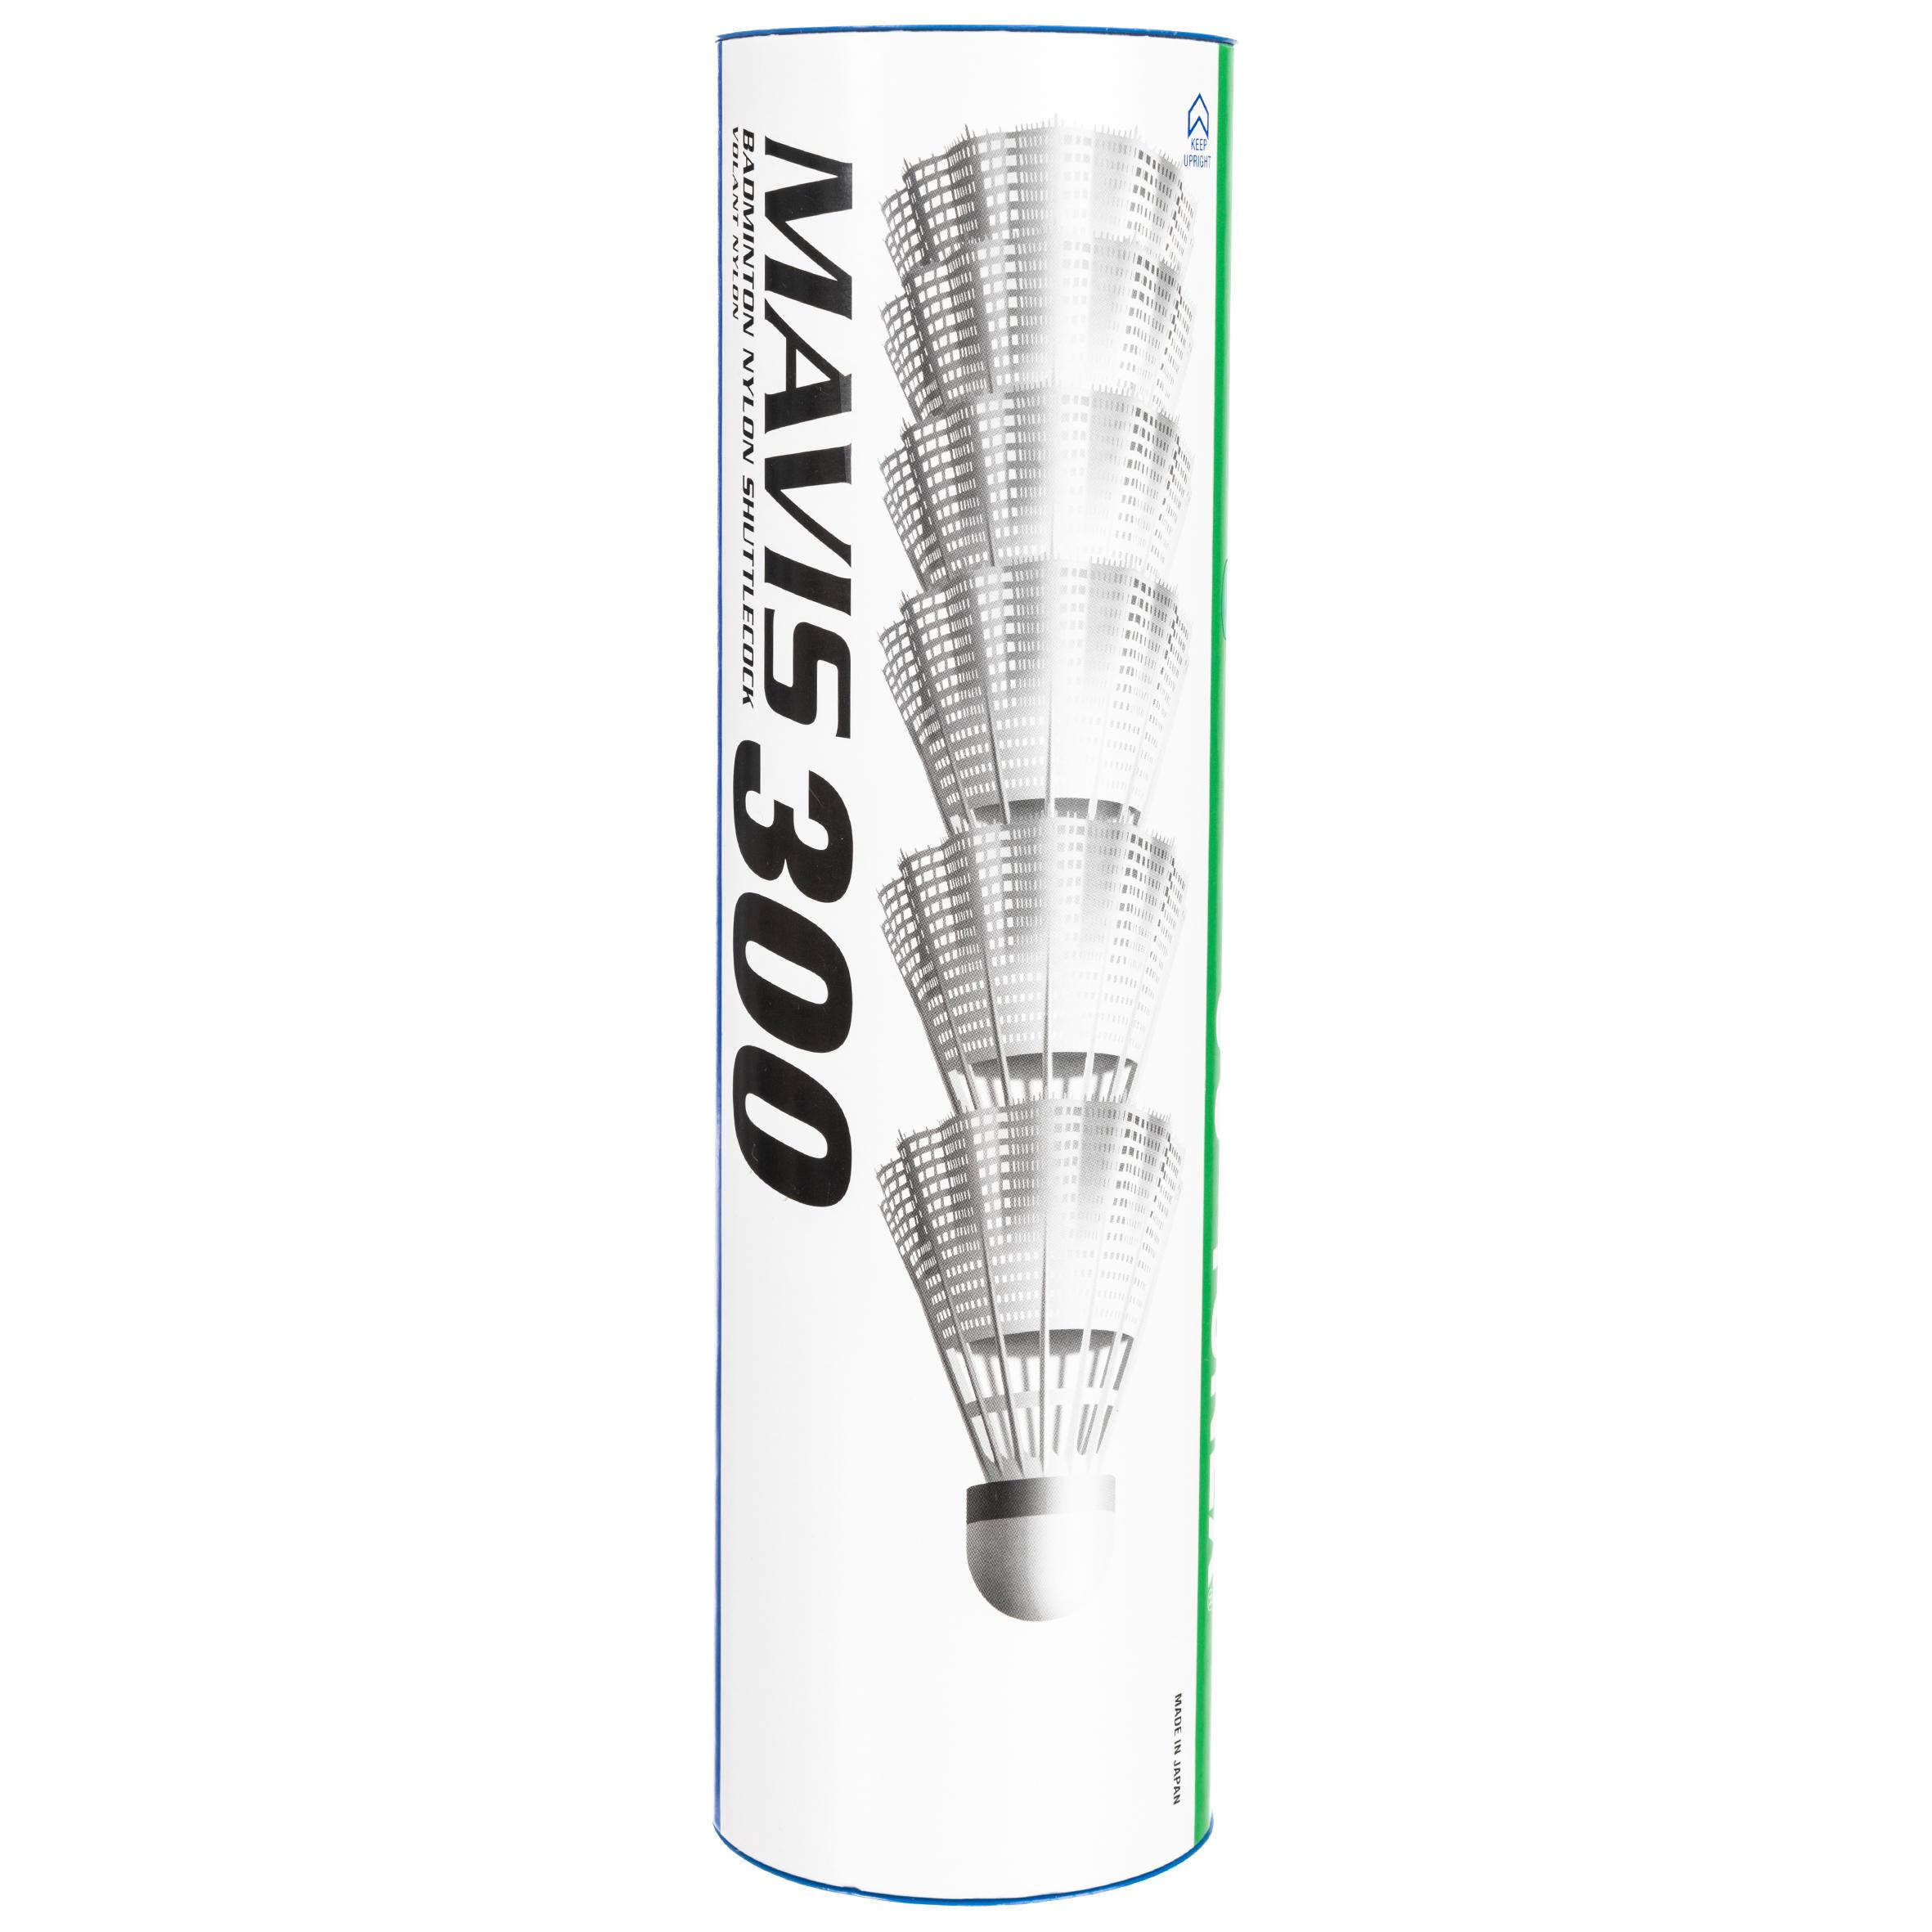 Boyauderie de l'est Badmintonshuttles Mavis 300 wit set van 6